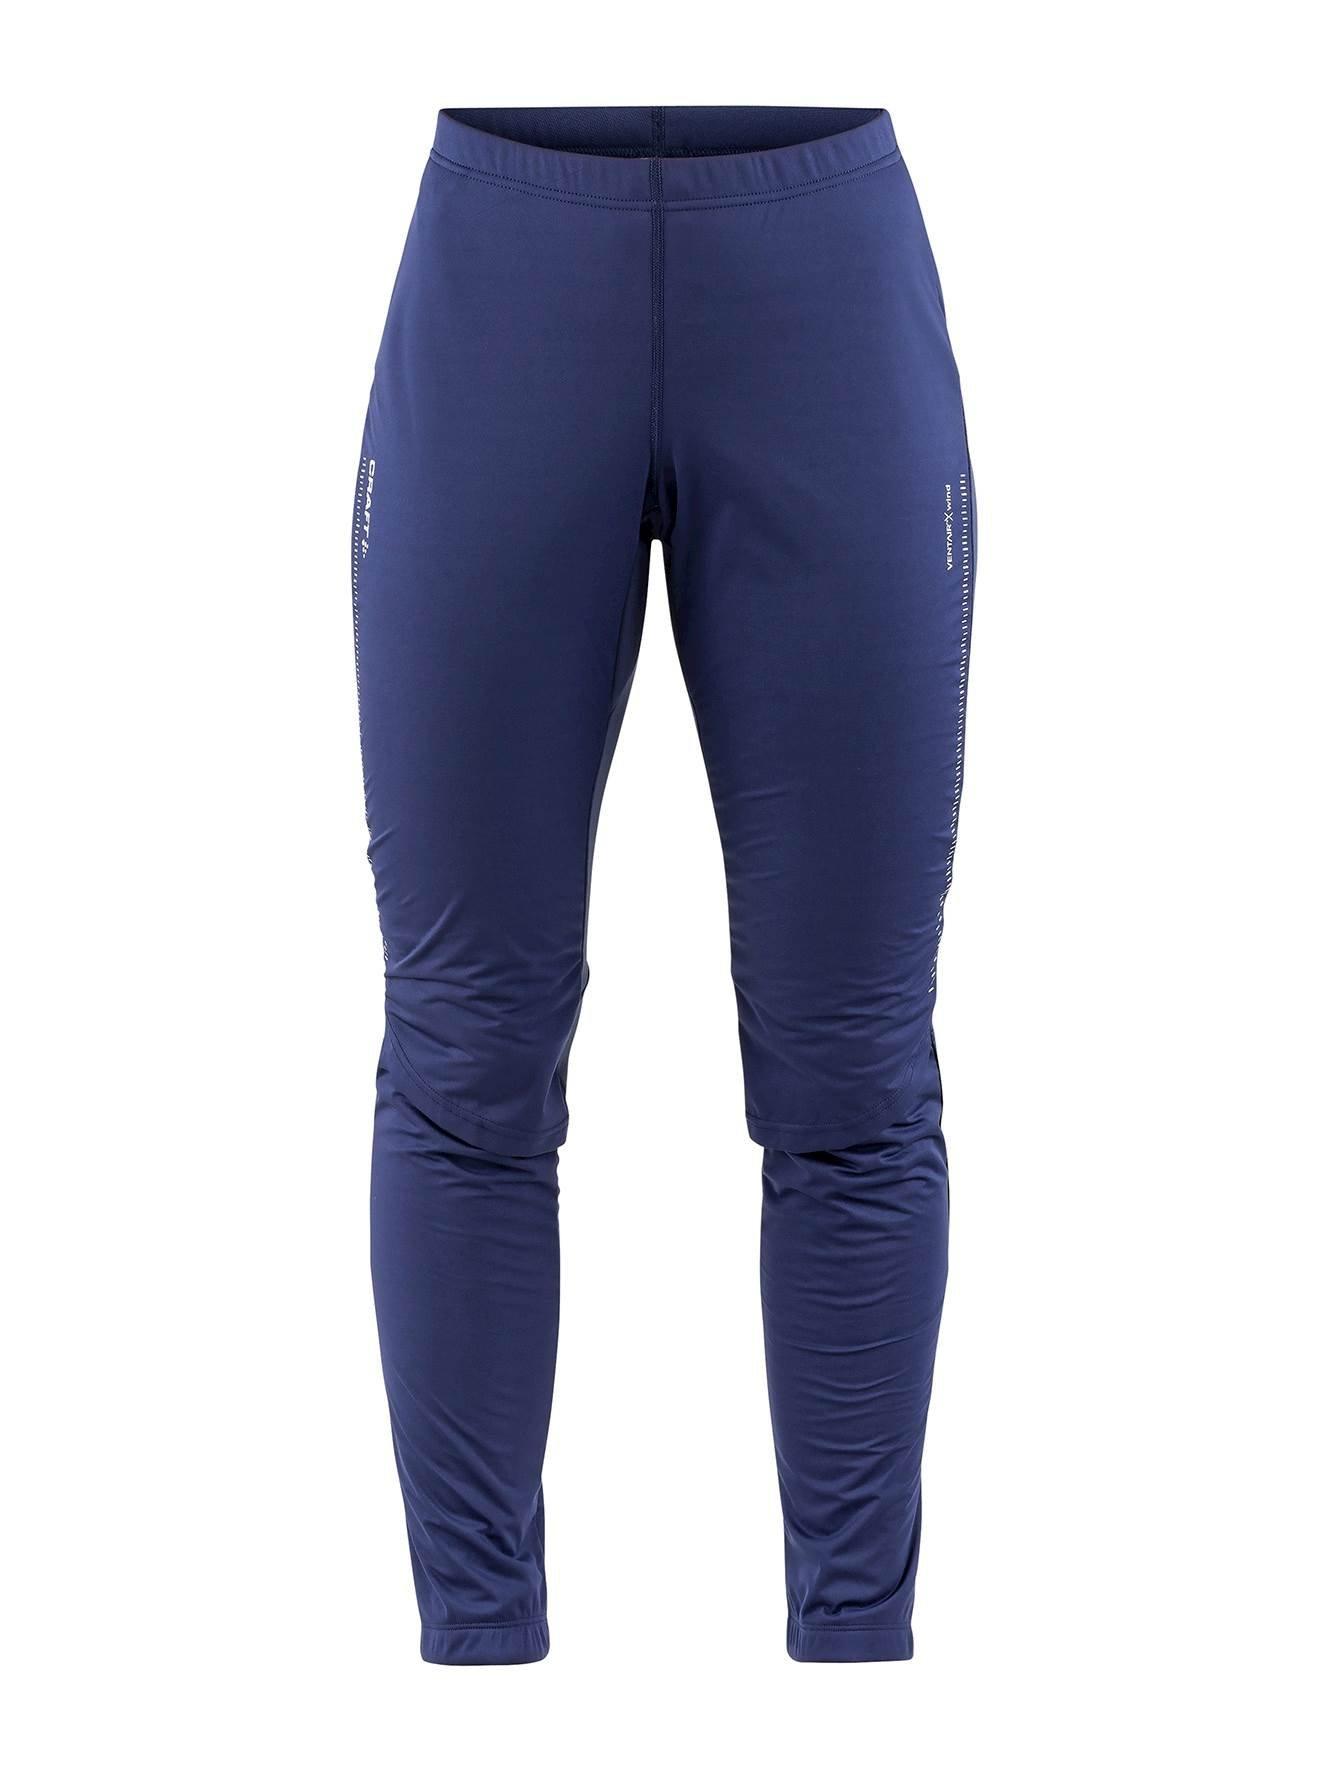 Craft W Kalhoty Storm 2.0 tmavě modrá S